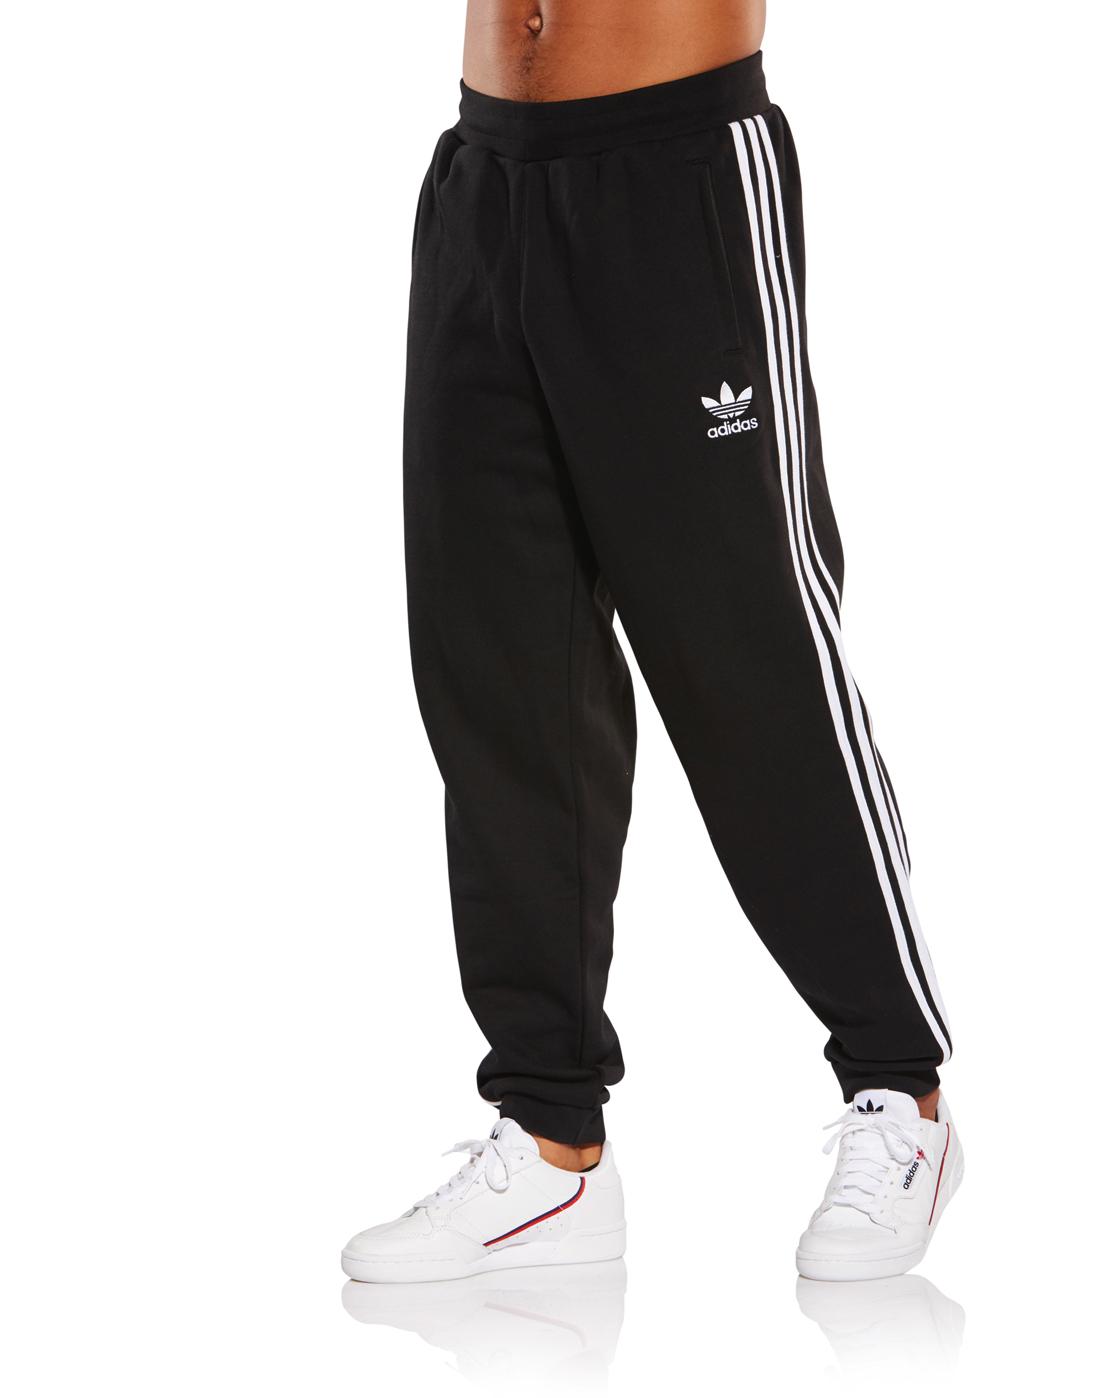 48acdde67 Men s adidas Originals 3 Stripe Pants